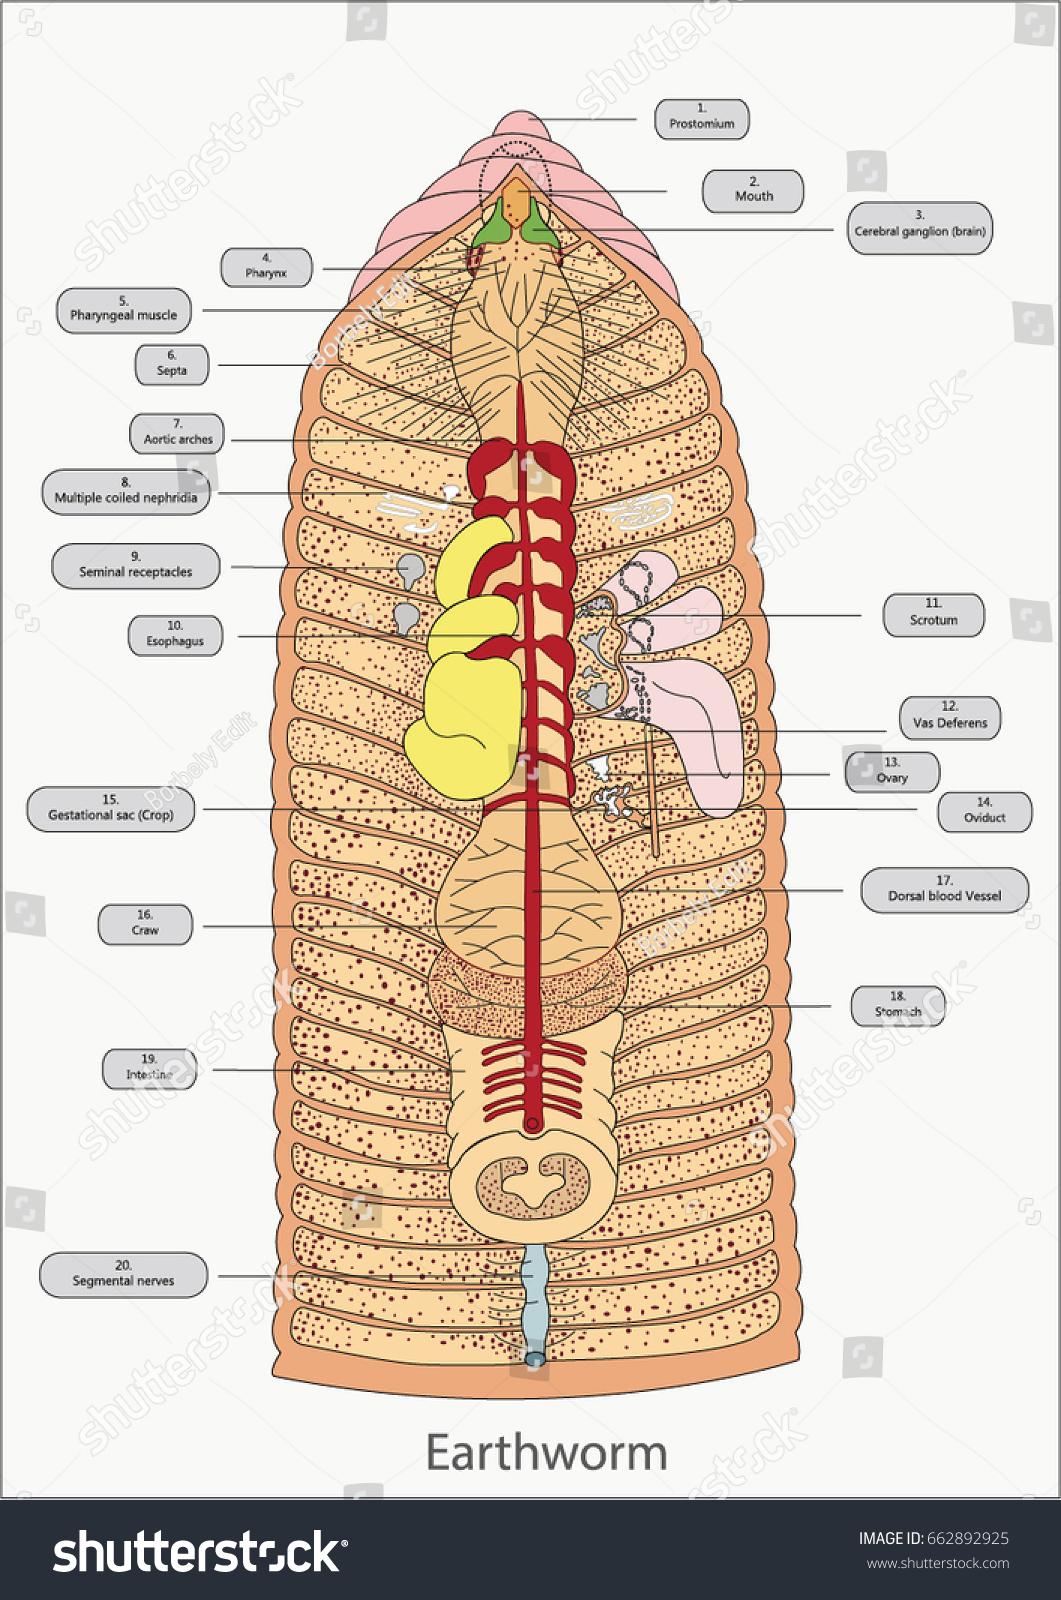 Earthworm Anatomy Vector Illustration Stock Vector 662892925 ...